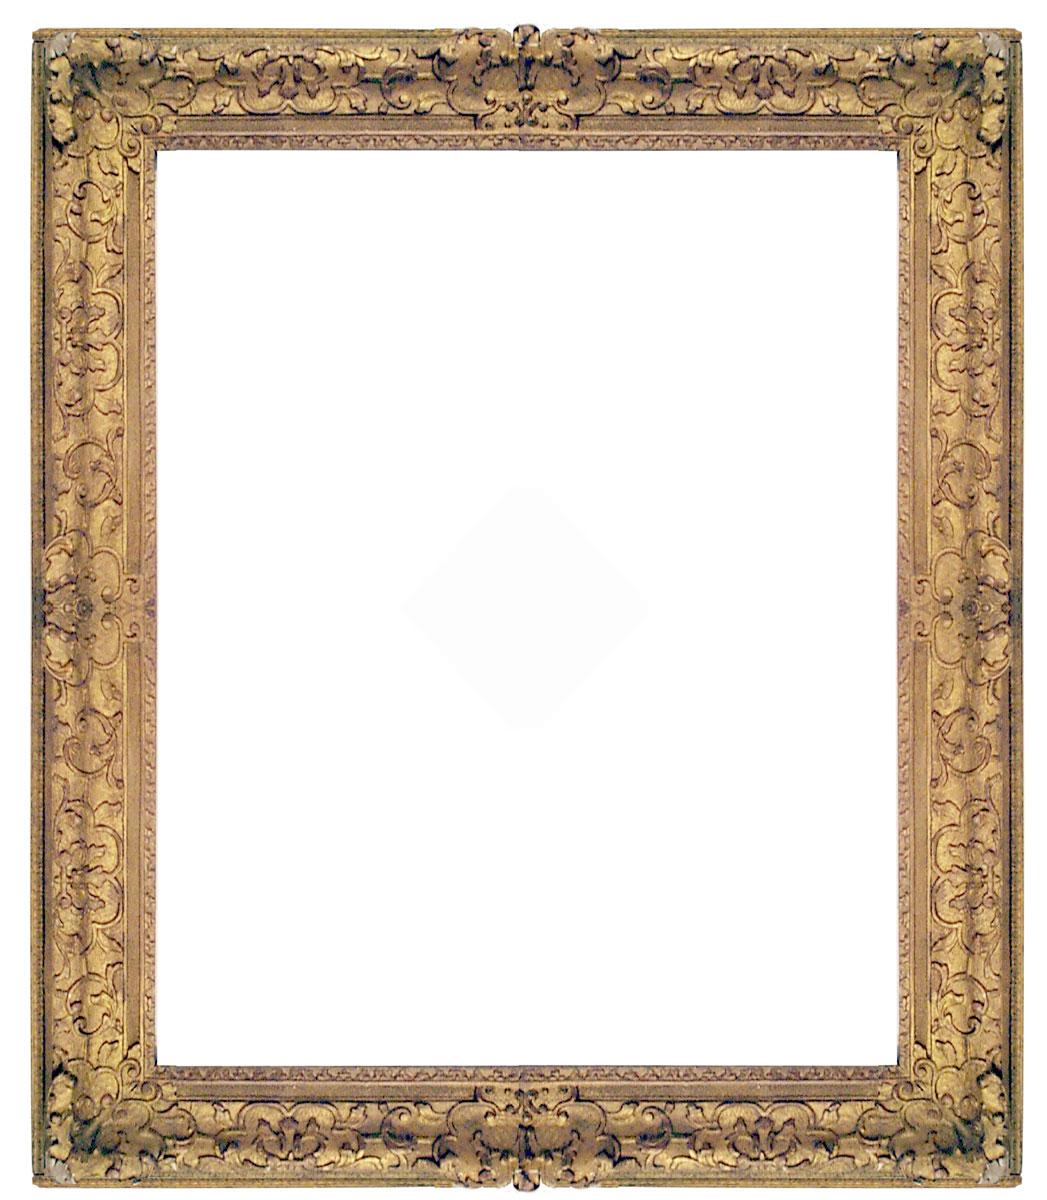 School Picture Frames